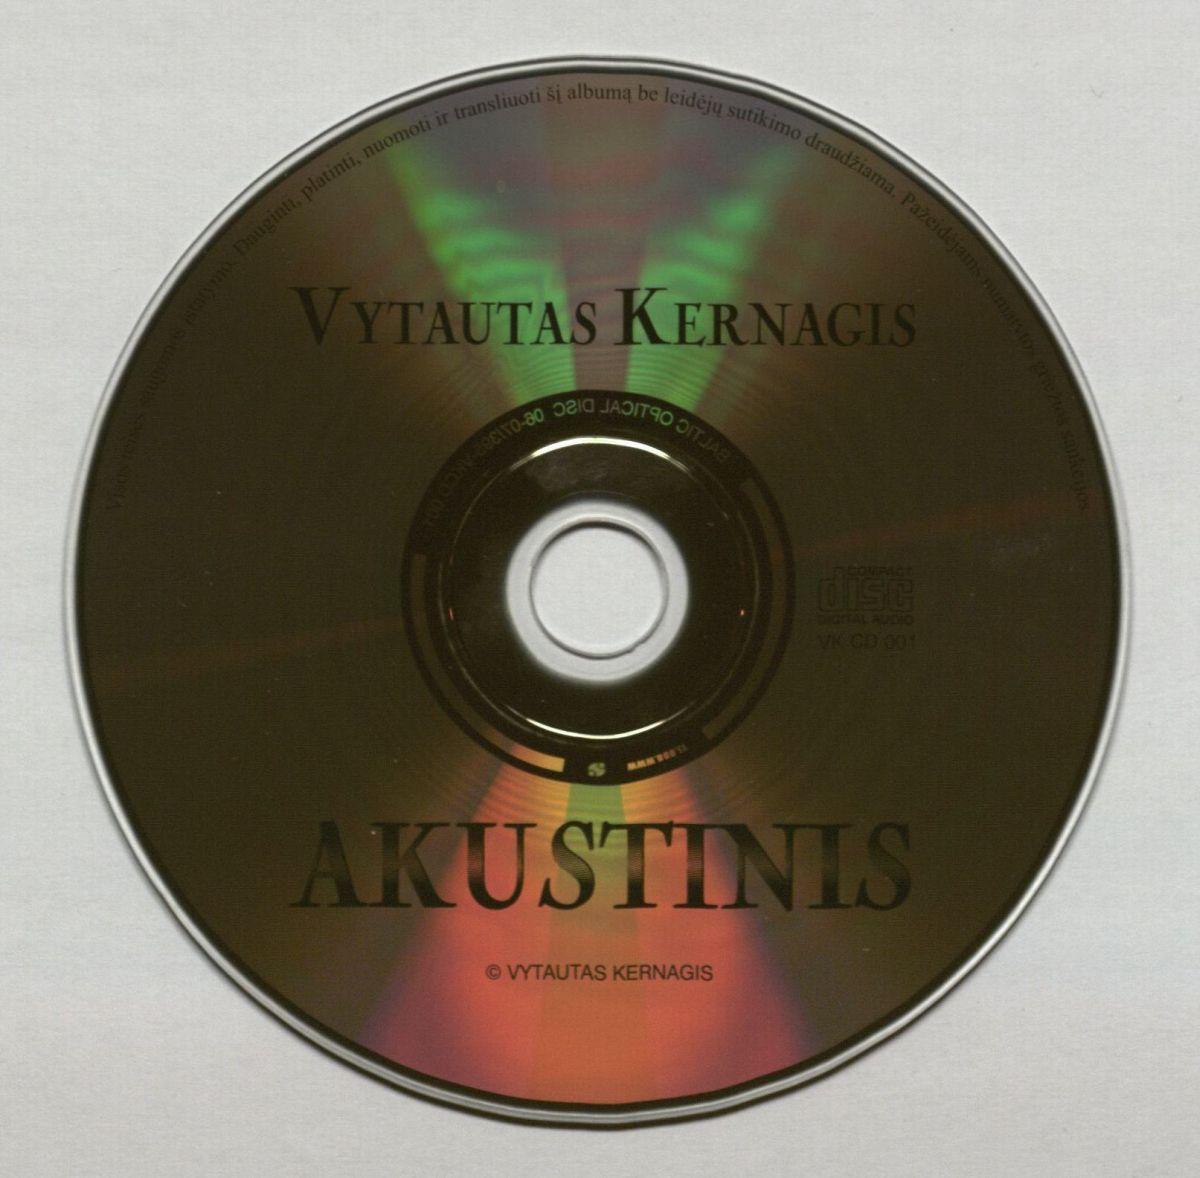 akustinis_disk.jpg